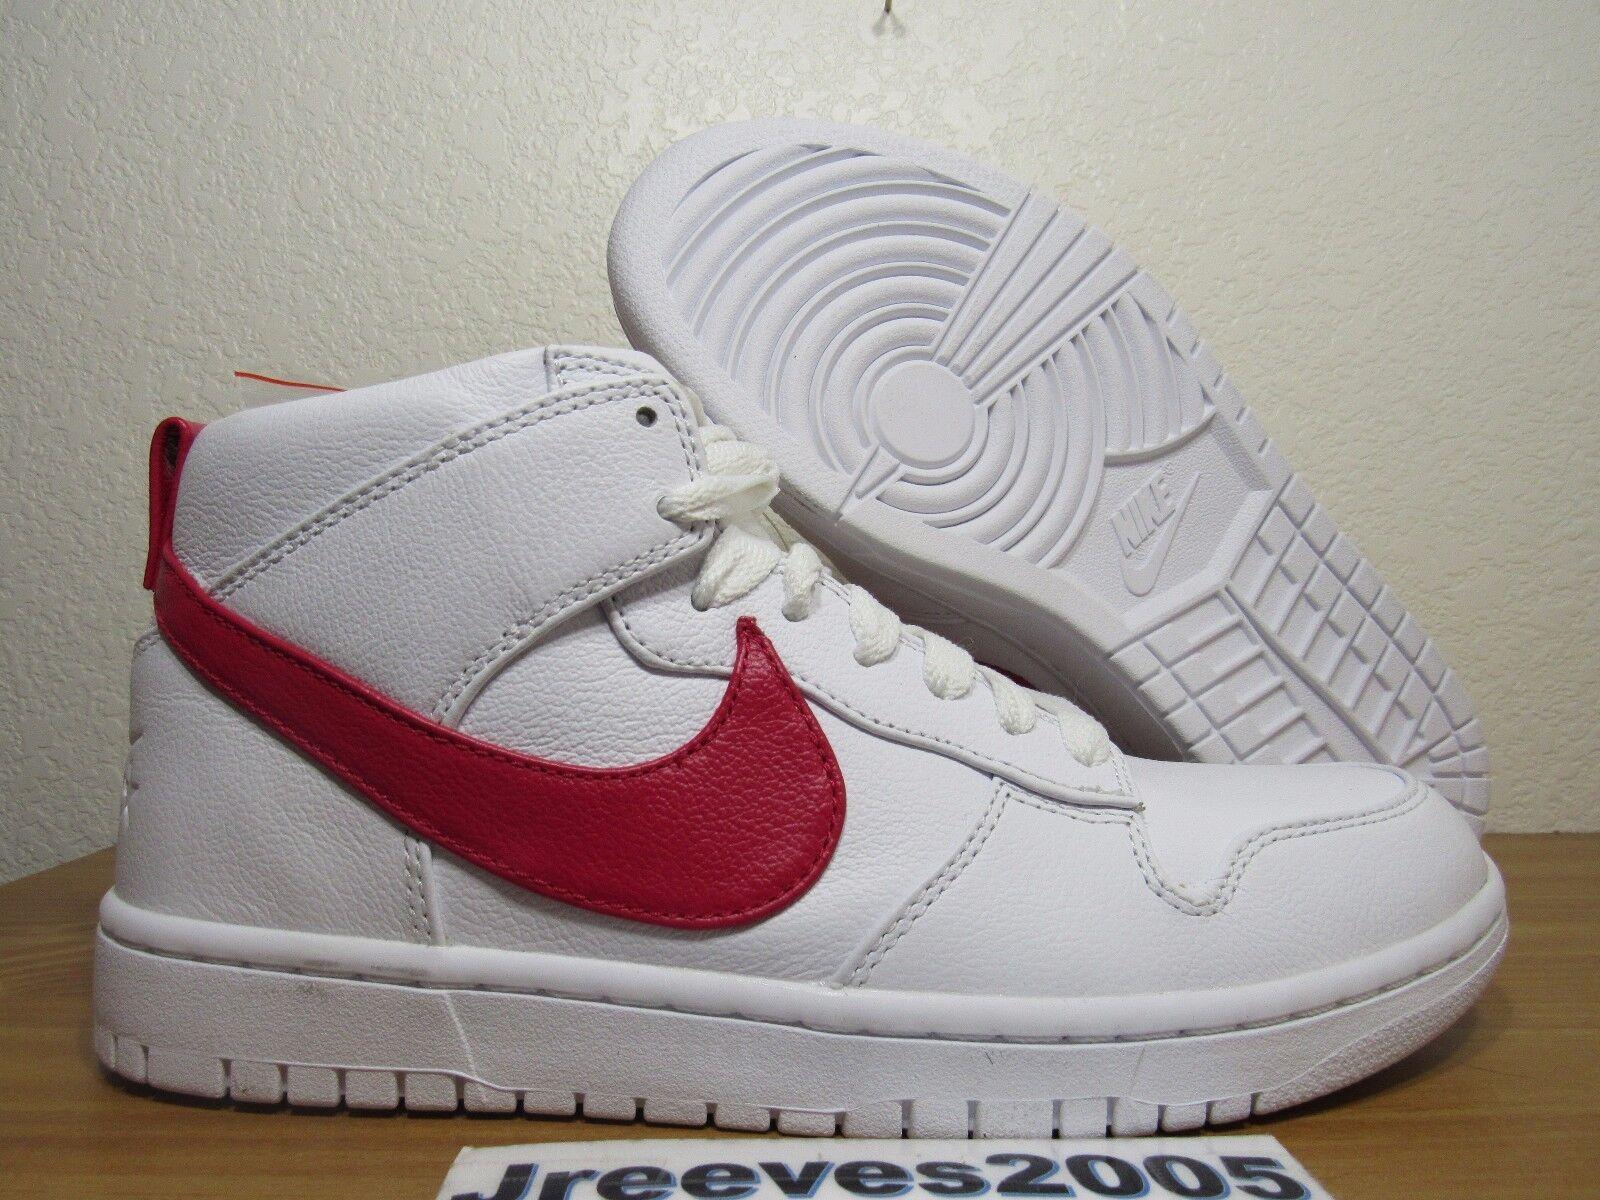 NikeLab x RICCARDO TISCI Dunk Lux Chukka Sz 9 100% Authentic Nike RT 910088 100